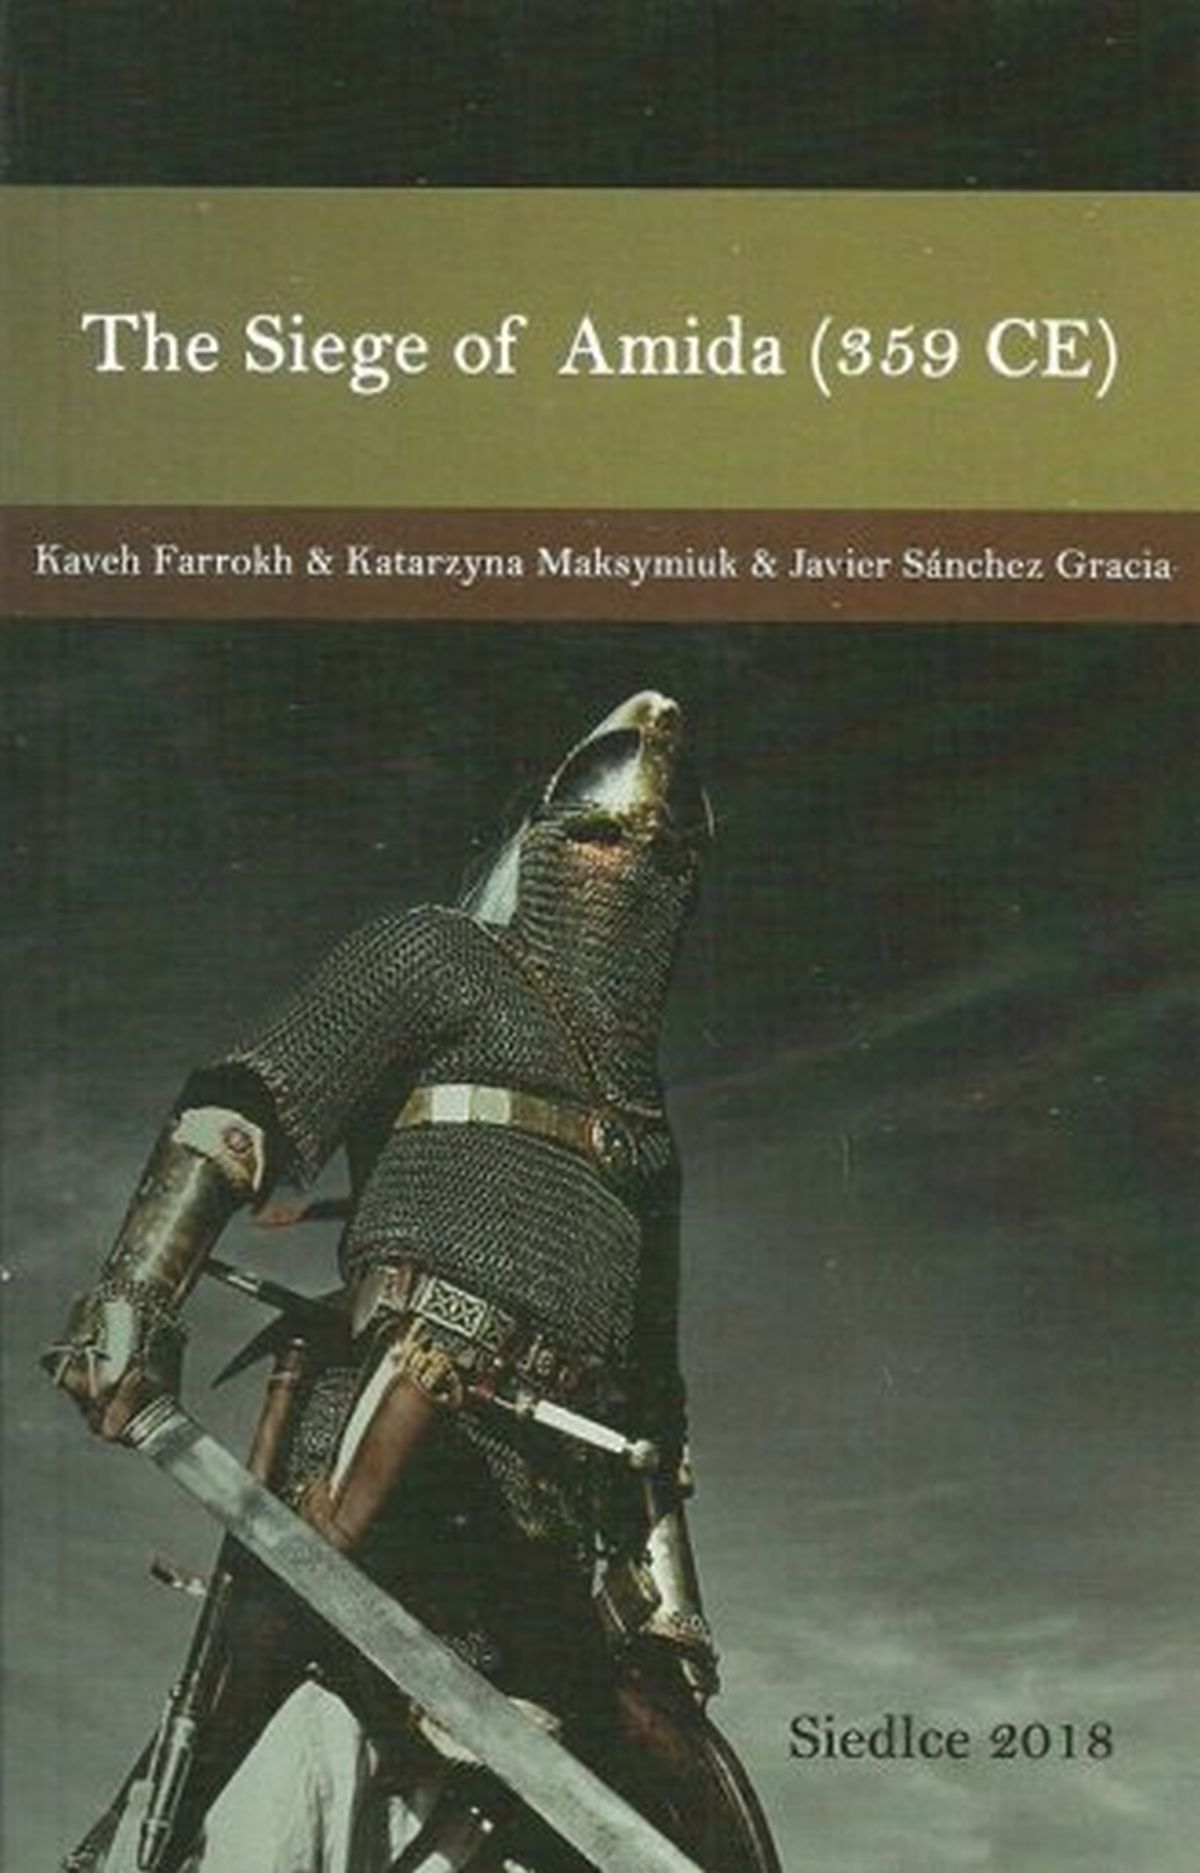 Kaveh Farrokh, Katarzyna Maksymiuk, Javier Sanchez Gracia, The Siege of Amida (359 CE)